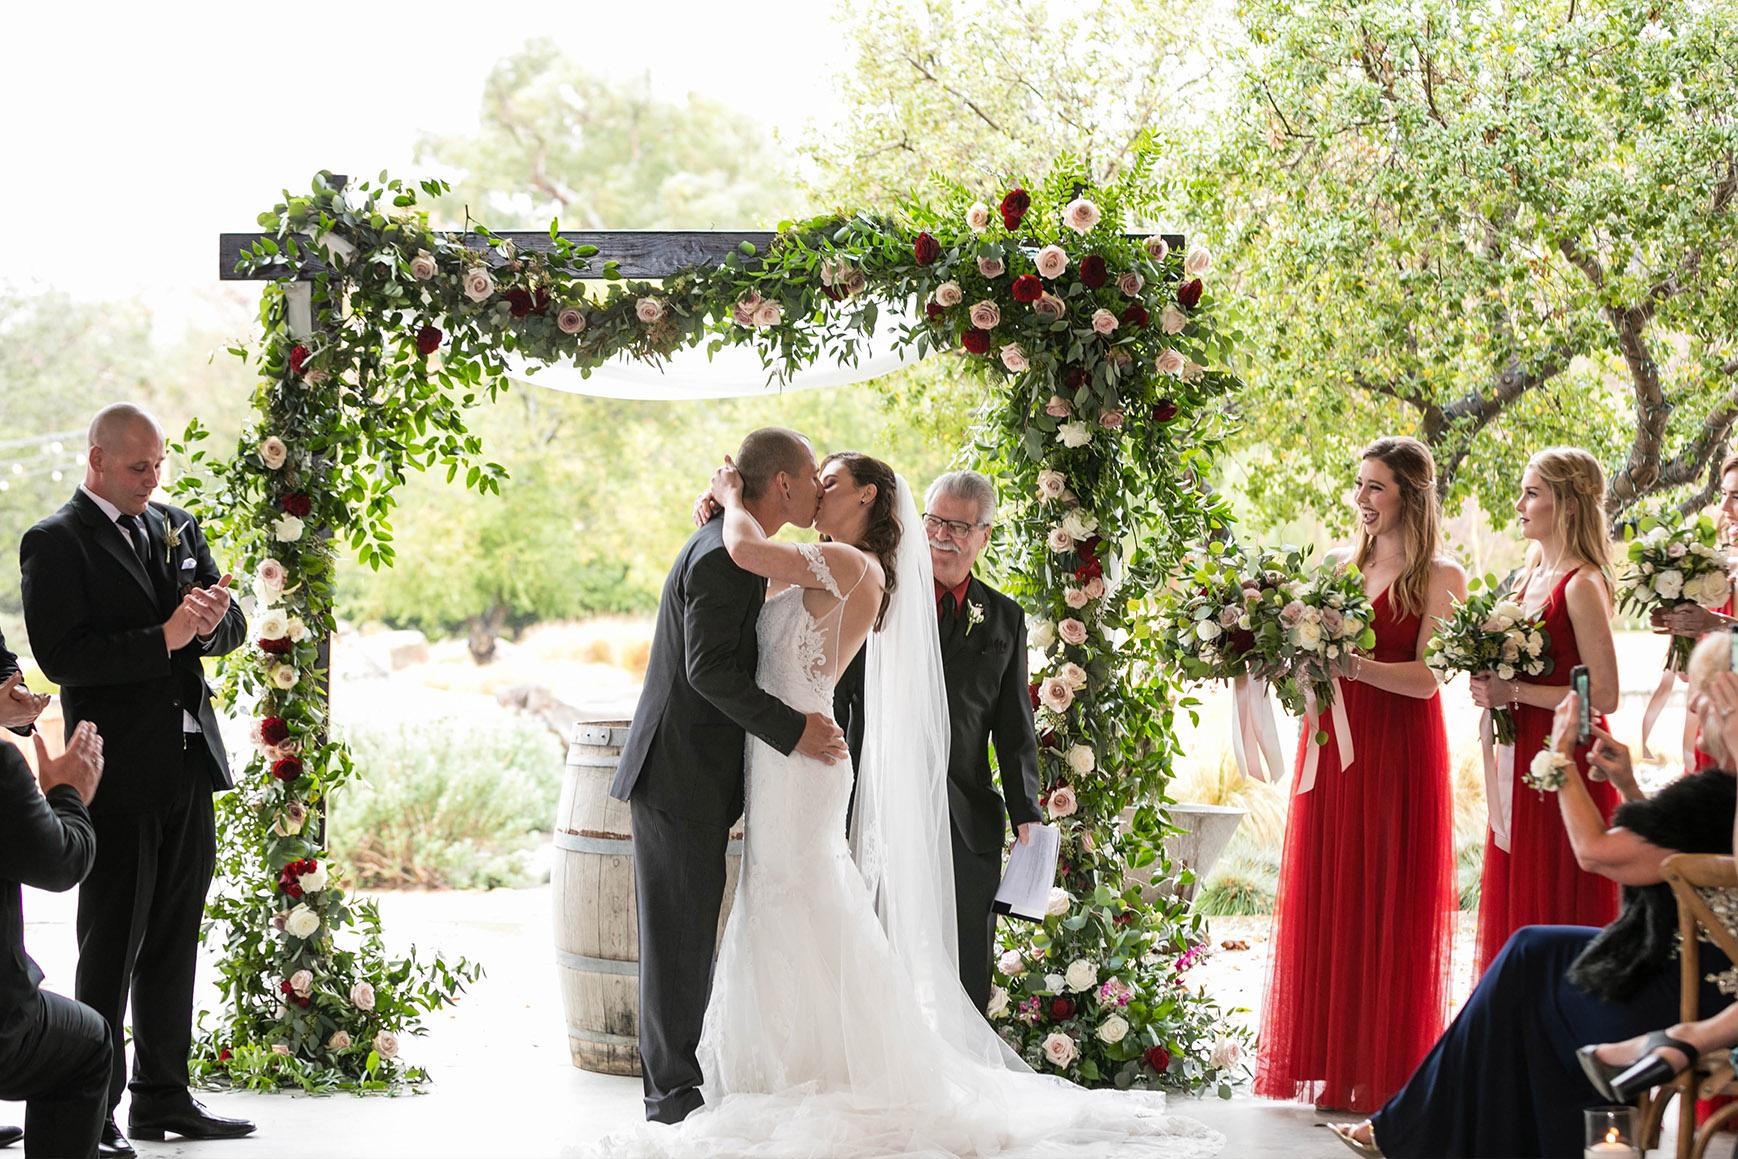 Warm Indoor Cerermony - Galway Downs - Temecula, California - Riverside County - Wedgewood Weddings